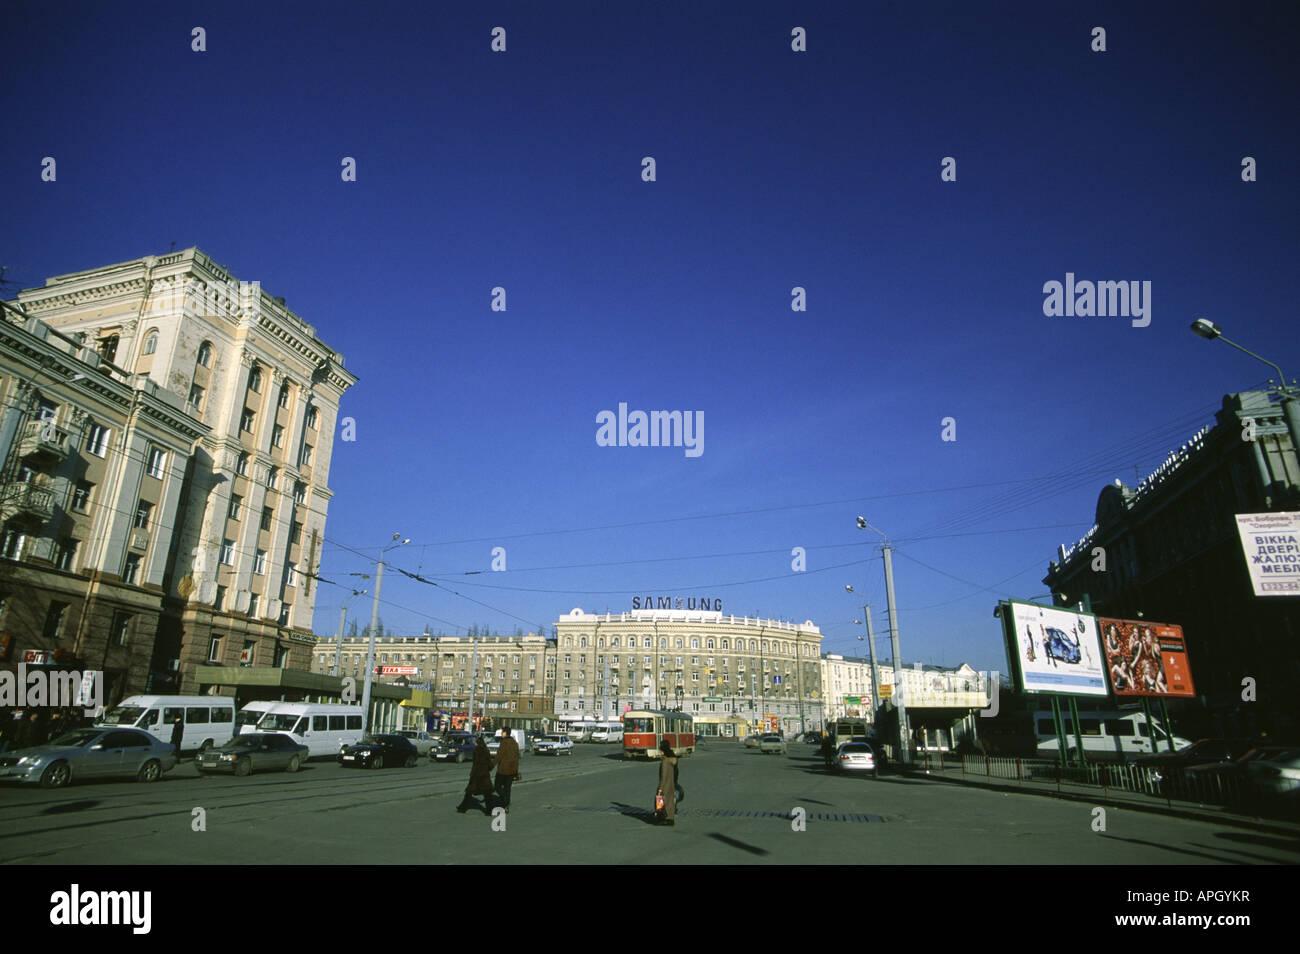 City centre Dnepropetrovsk Ukraine - Stock Image